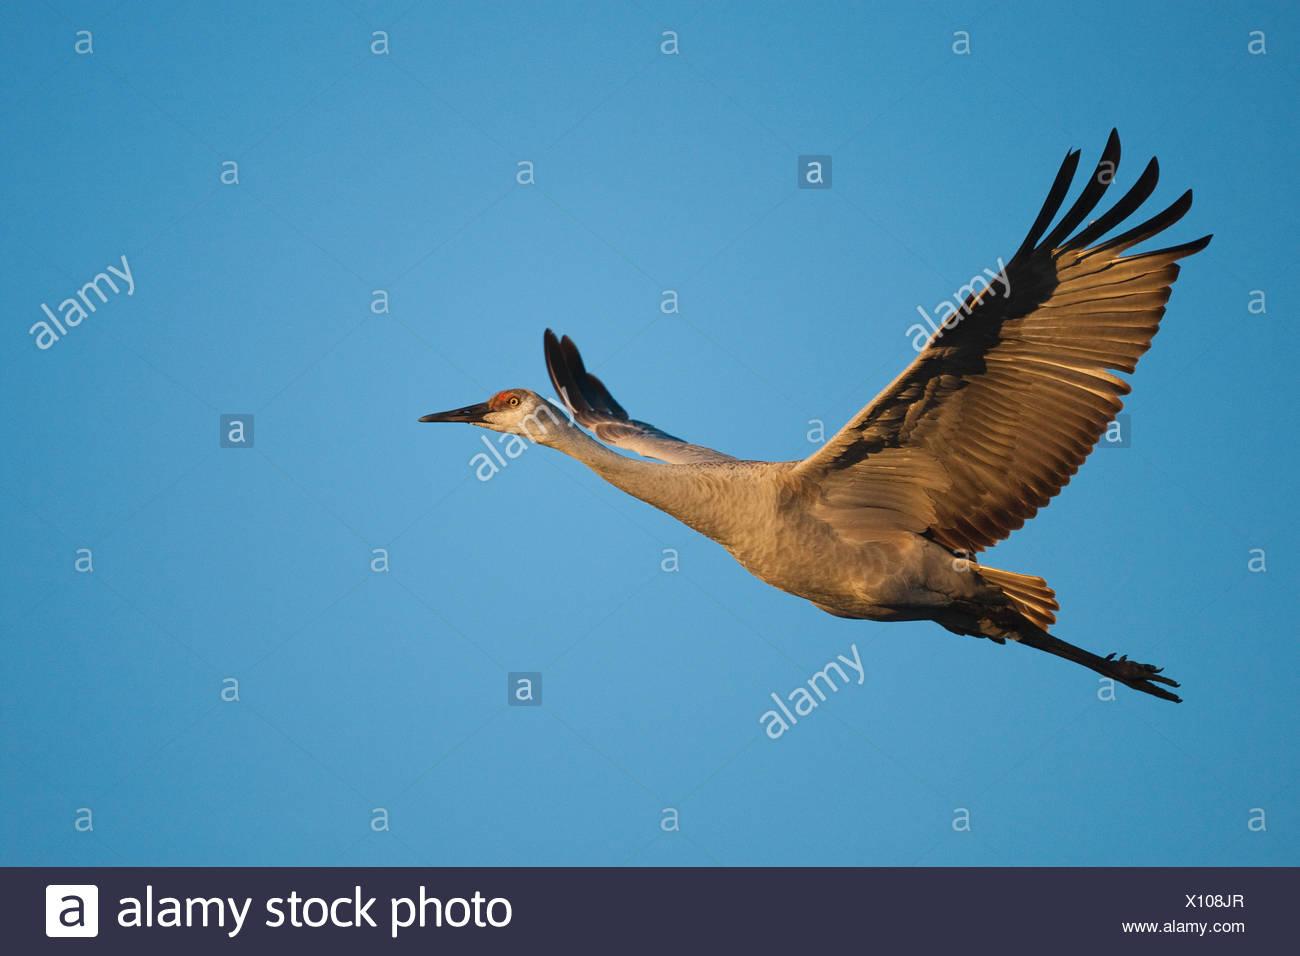 Sandhill Crane (Grus canadensis) adult in flight, Bosque del Apache National Wildlife Refuge , New Mexico, USA - Stock Image